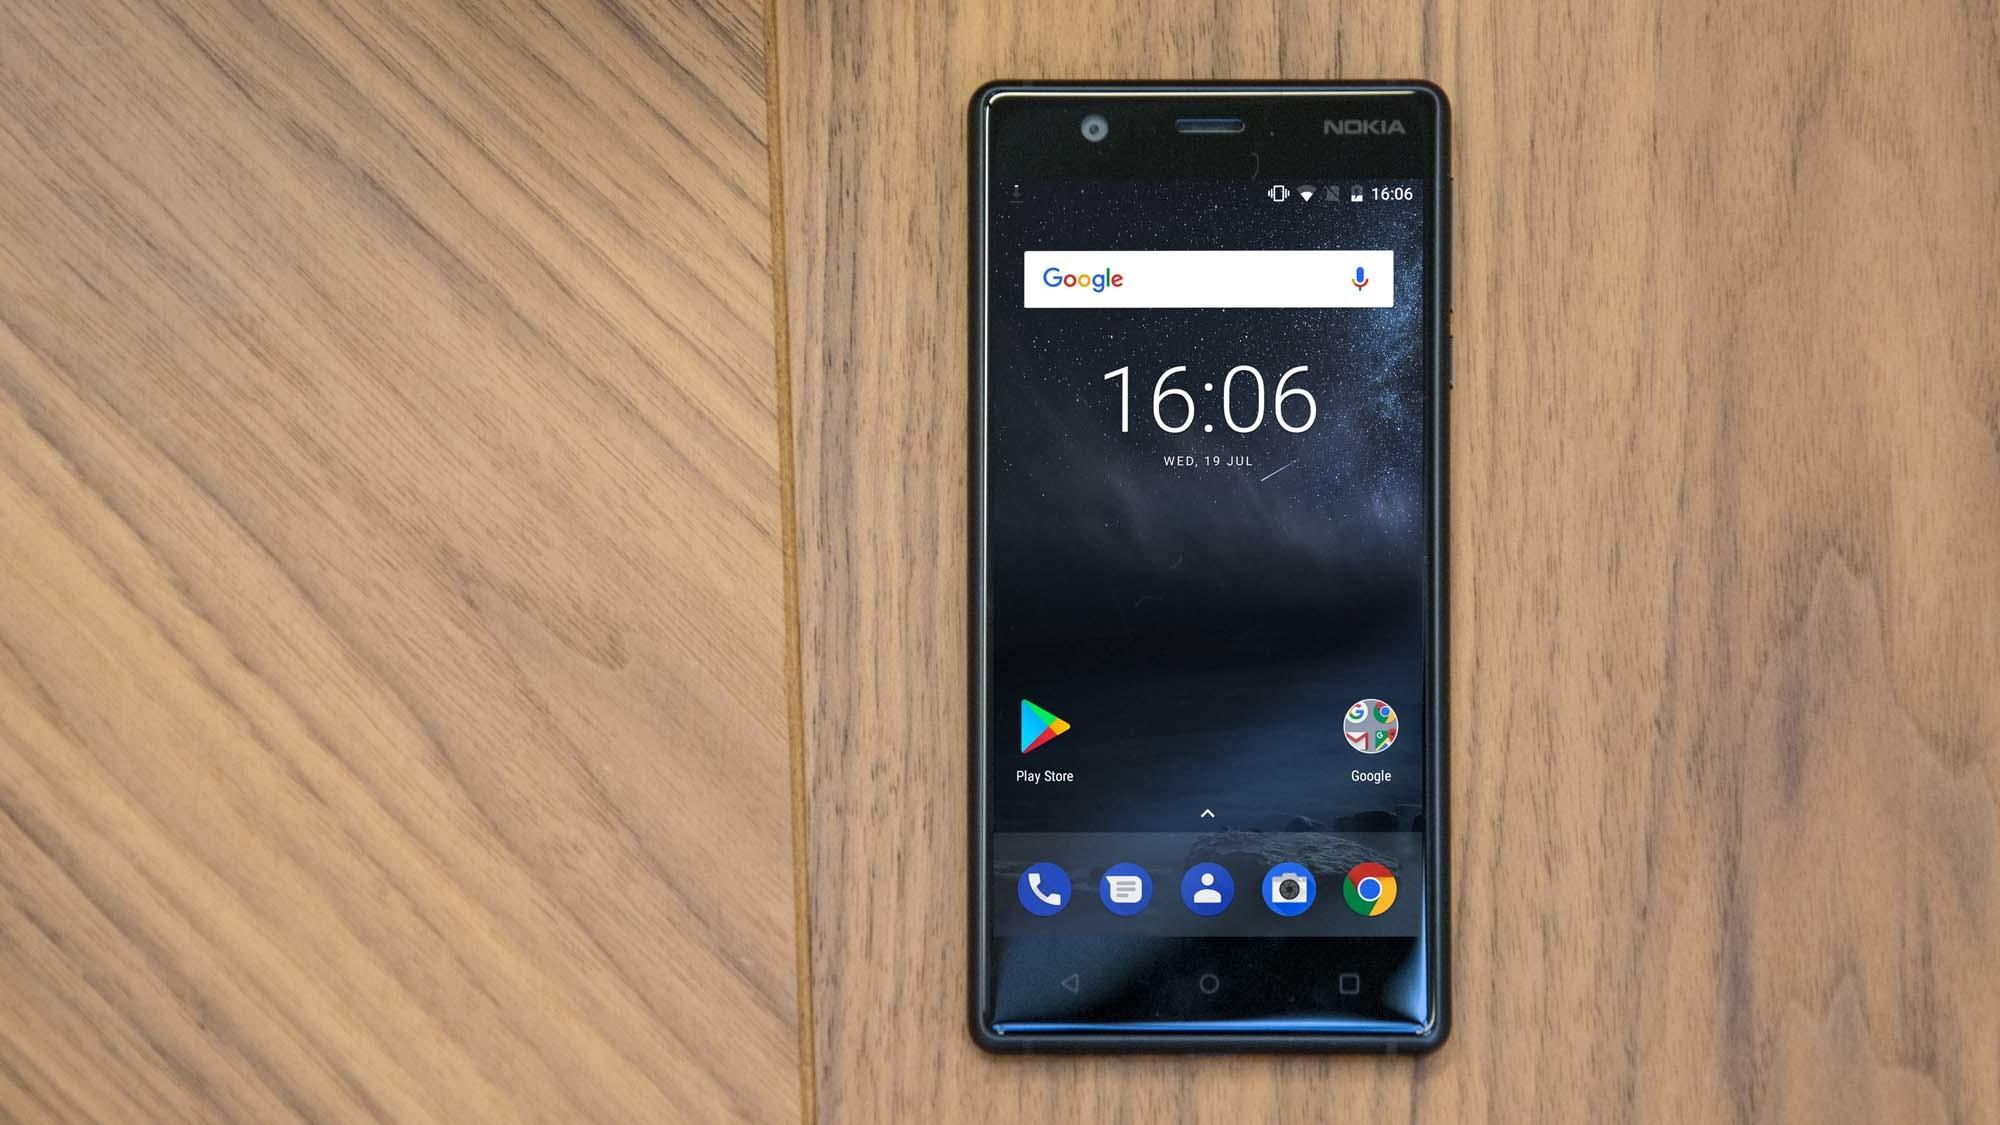 Nokia 3 все же поРучит обновРение до Android Oreo NestorPredein 06 декабря 2017